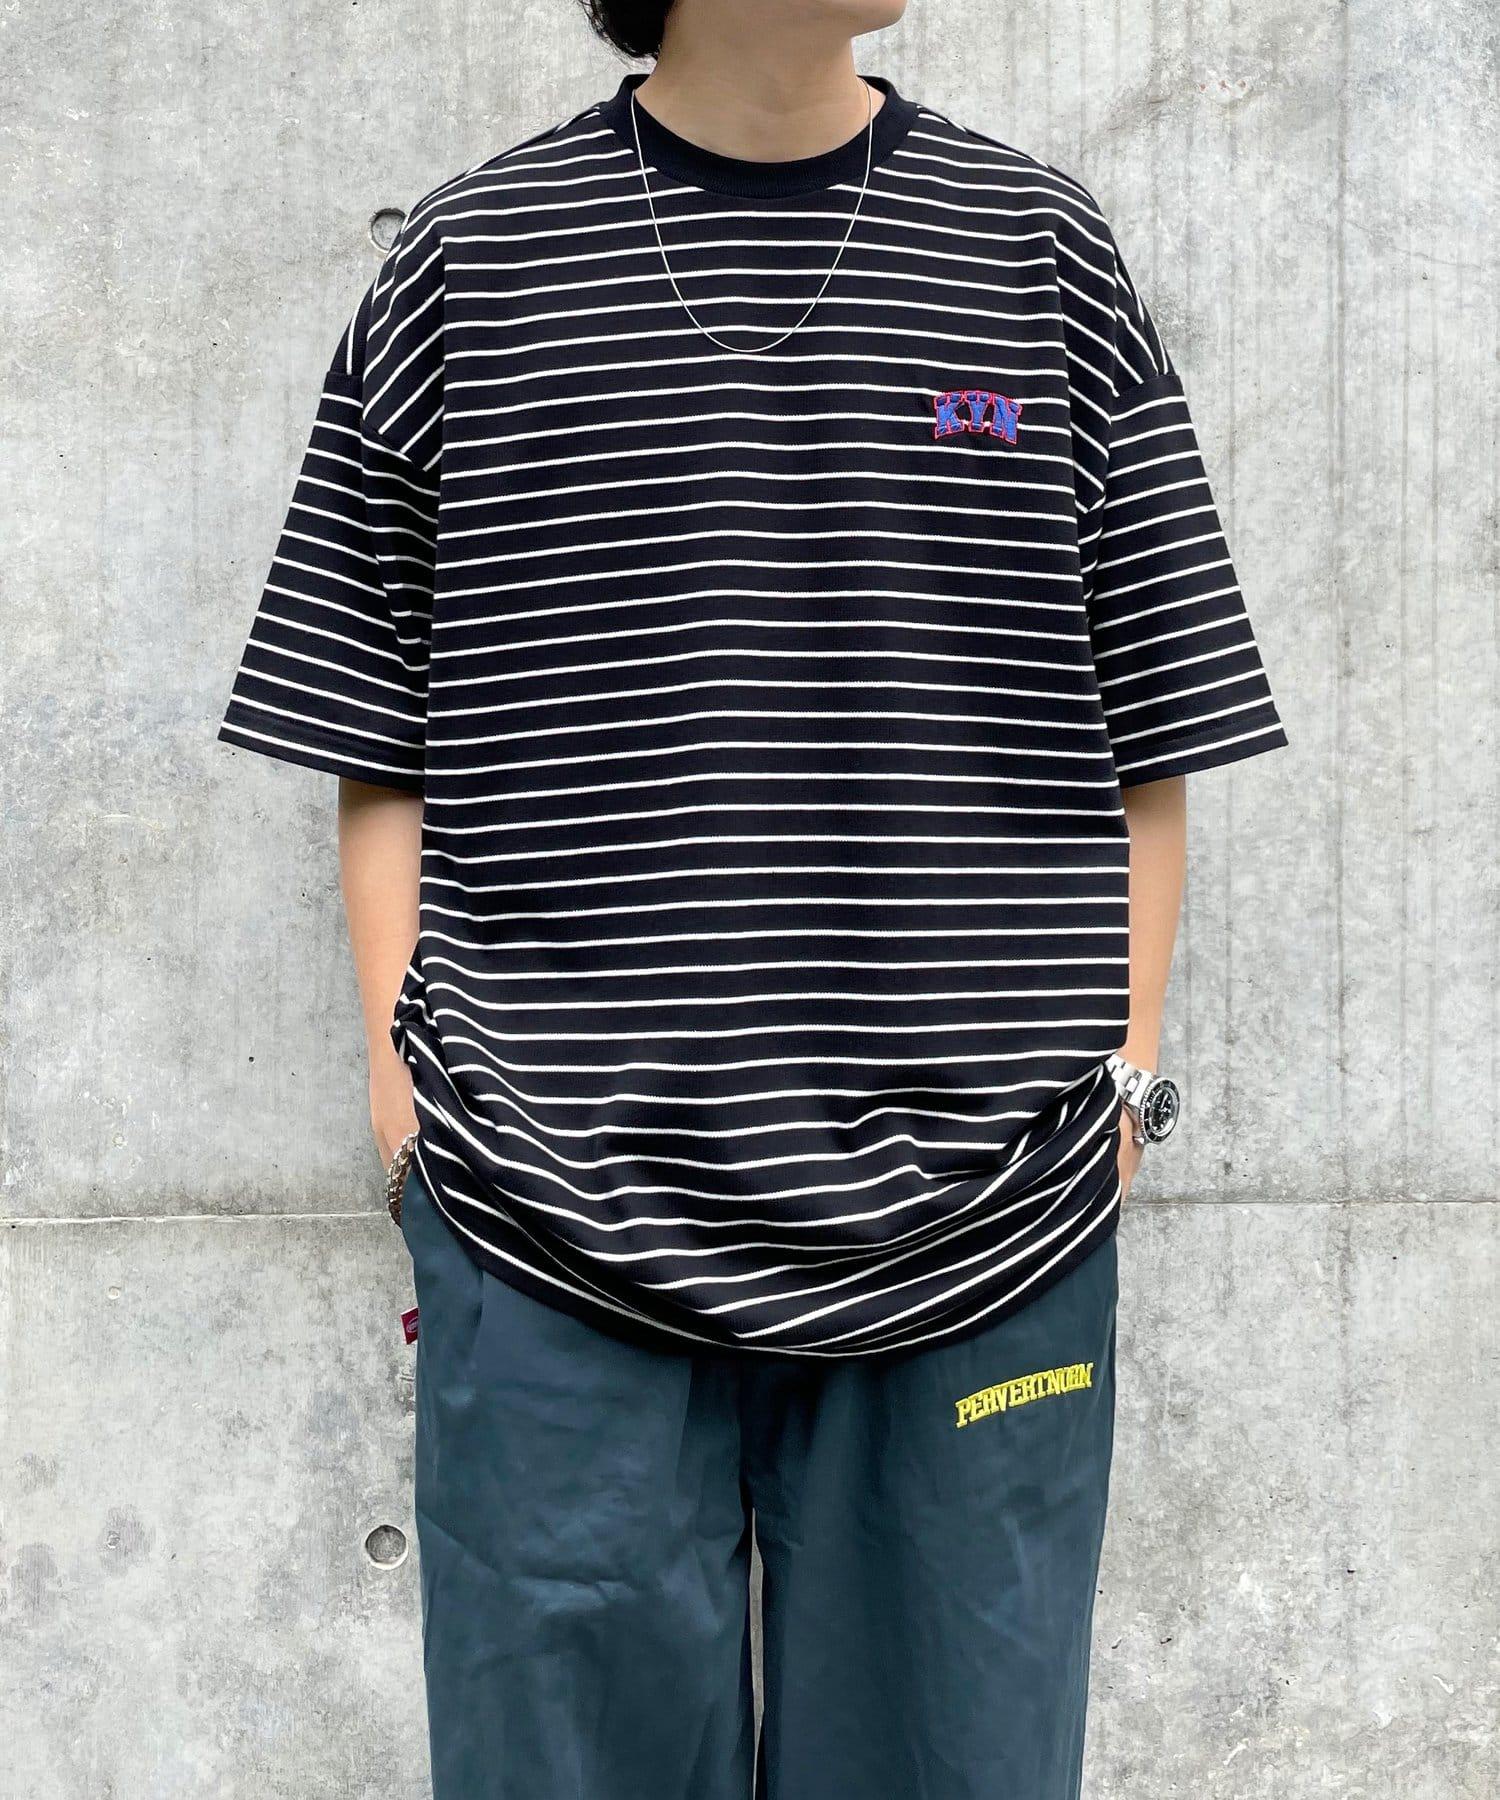 WHO'S WHO gallery(フーズフーギャラリー) 【KOOKY'N/クーキー】KY刺繍ボーダーTEE